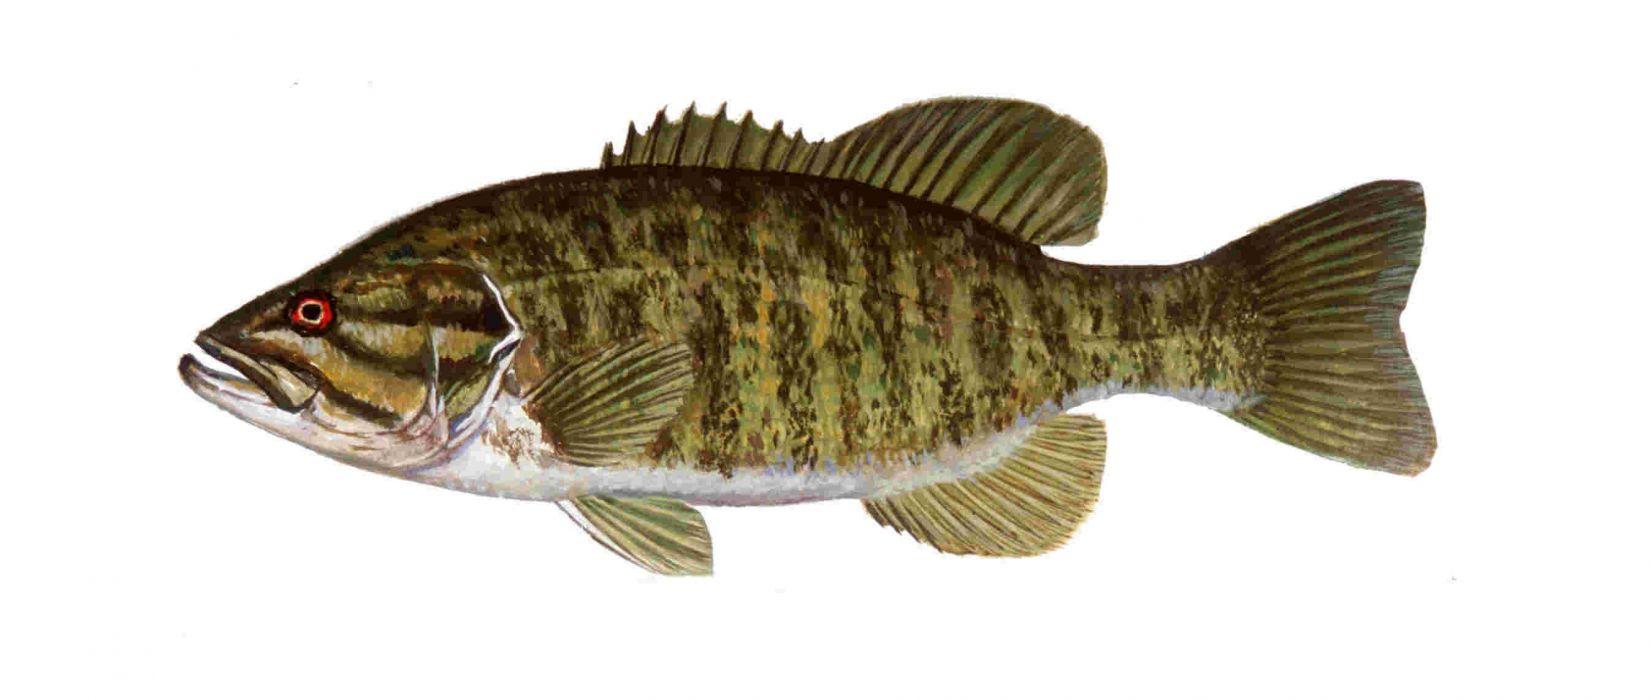 FISHING fish sport water fishes (32) wallpaper